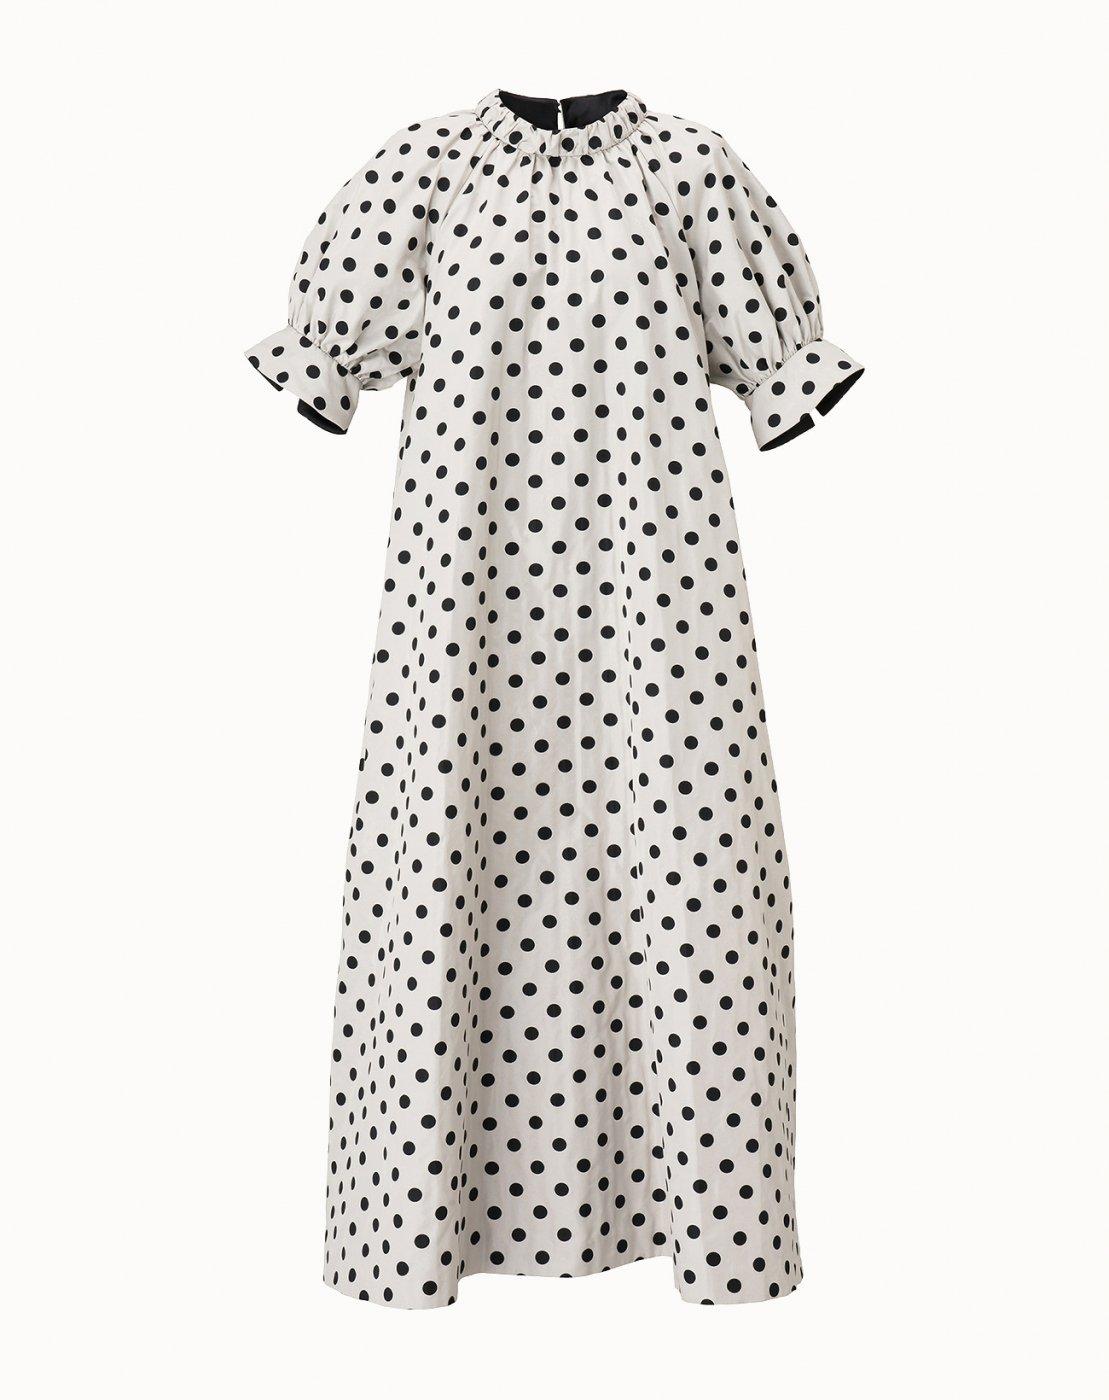 leur logette - Jacquard Dress  -Dot